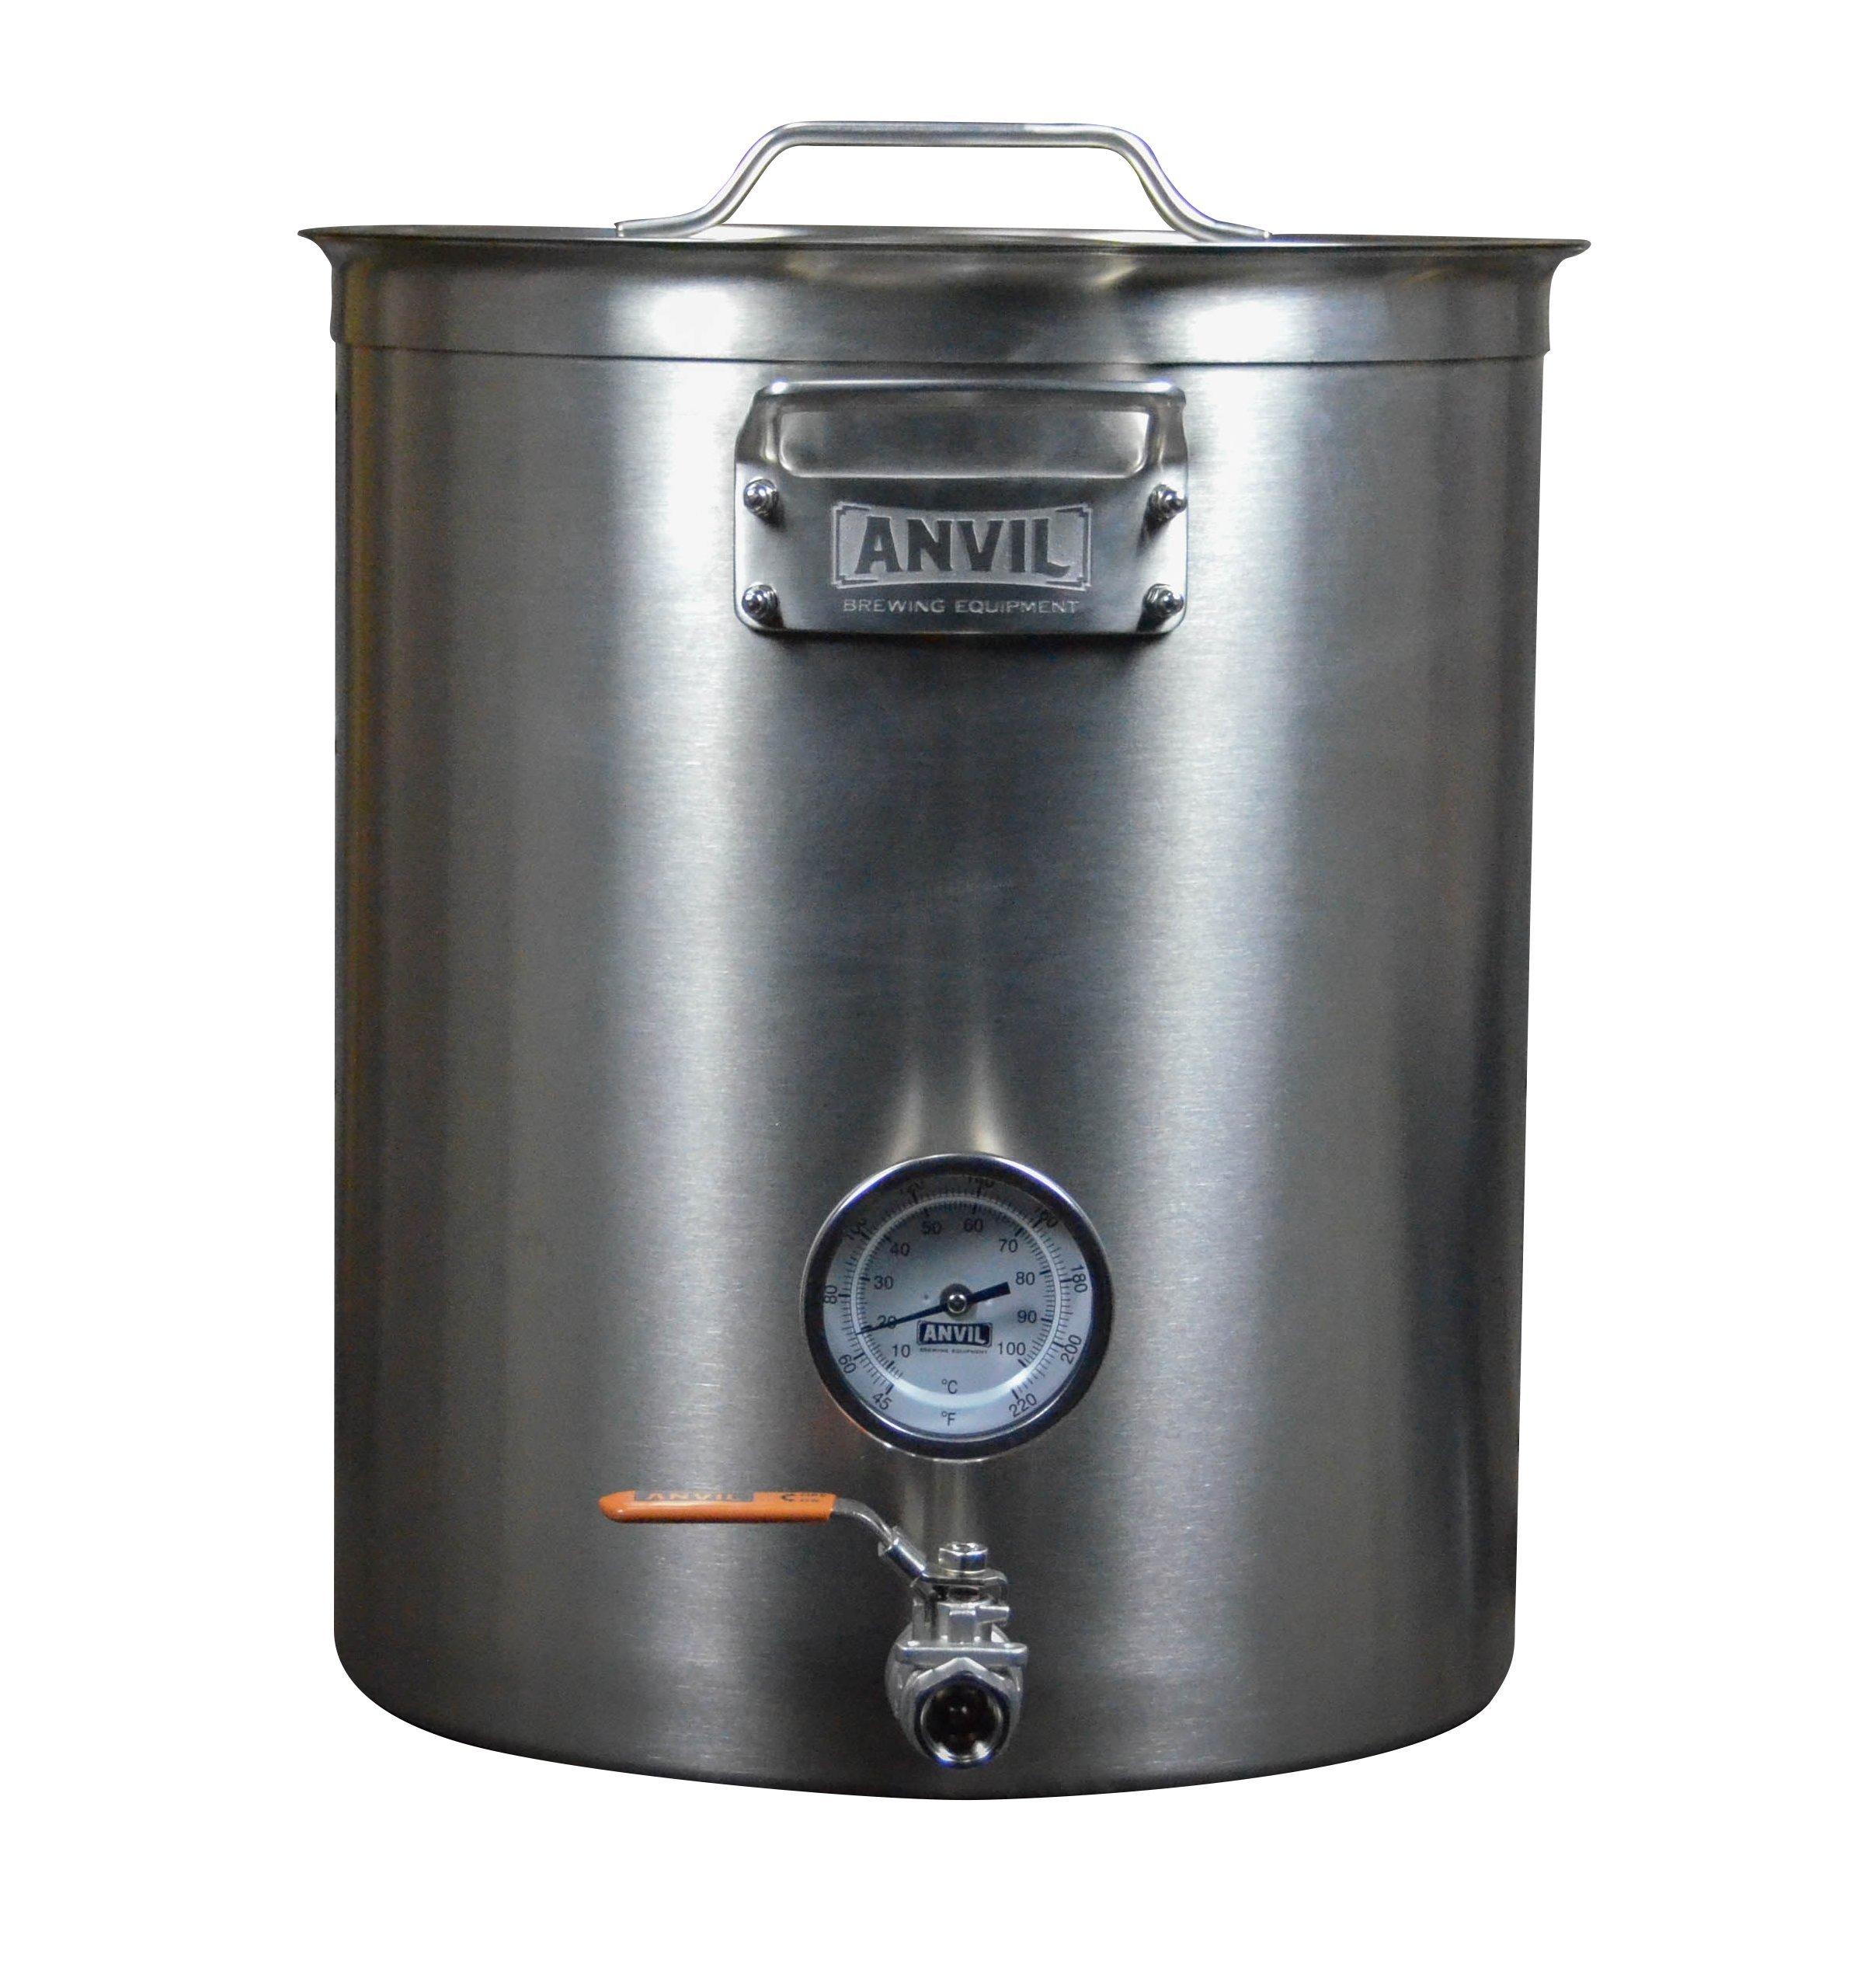 Anvil Brew Kettle 10 gal